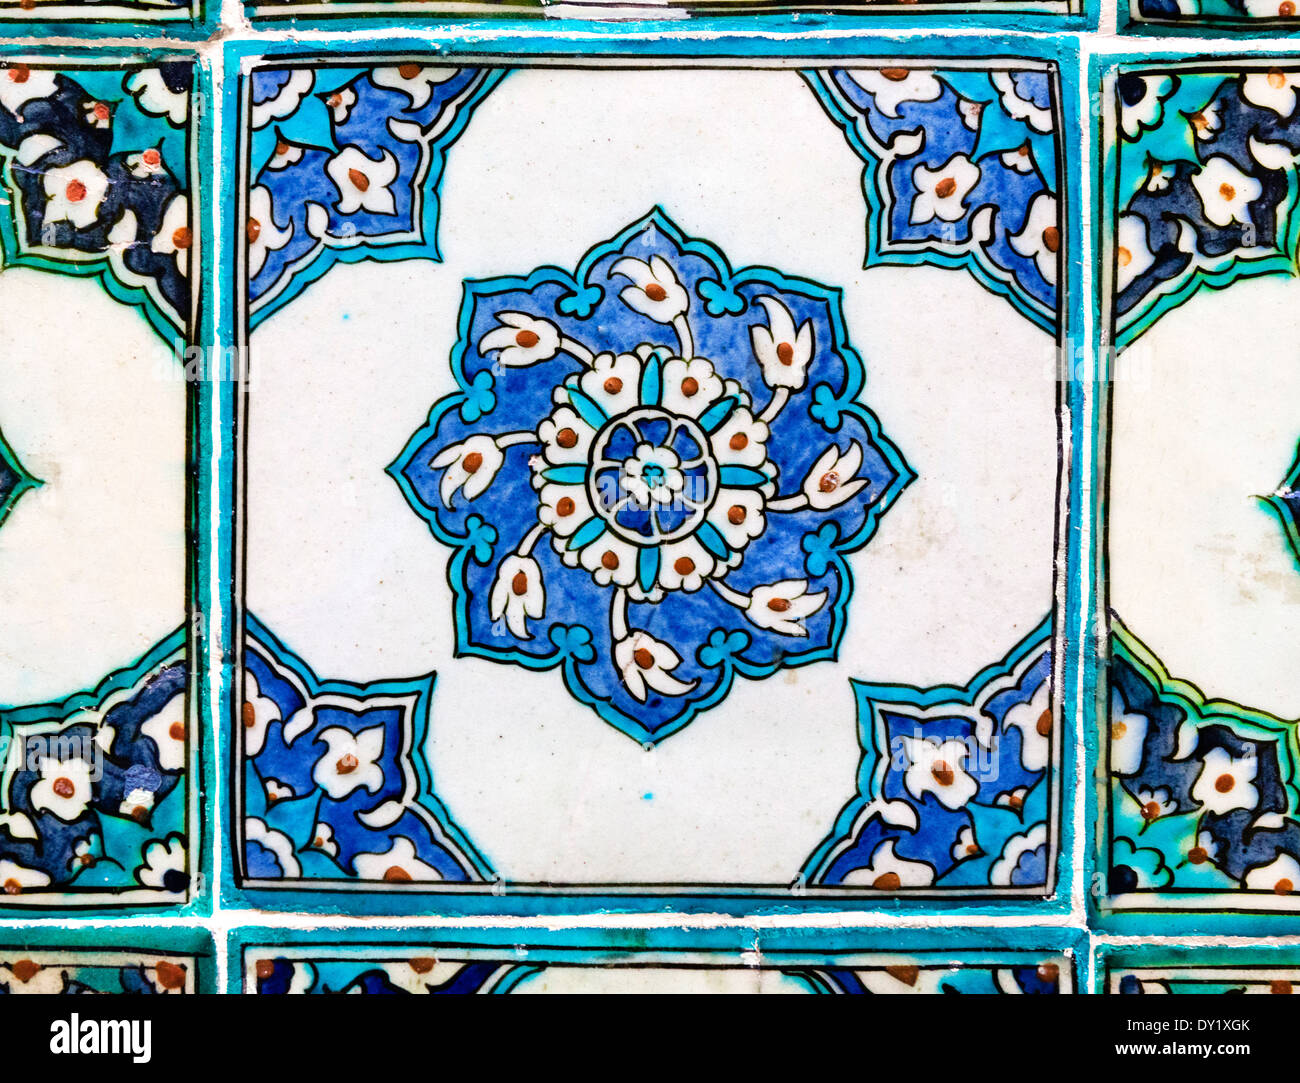 Piastrelle decorative all'Harem del Topkapi Palace (Topkapi Sarayi), quartiere di Sultanahmet, Istanbul, Turchia Immagini Stock